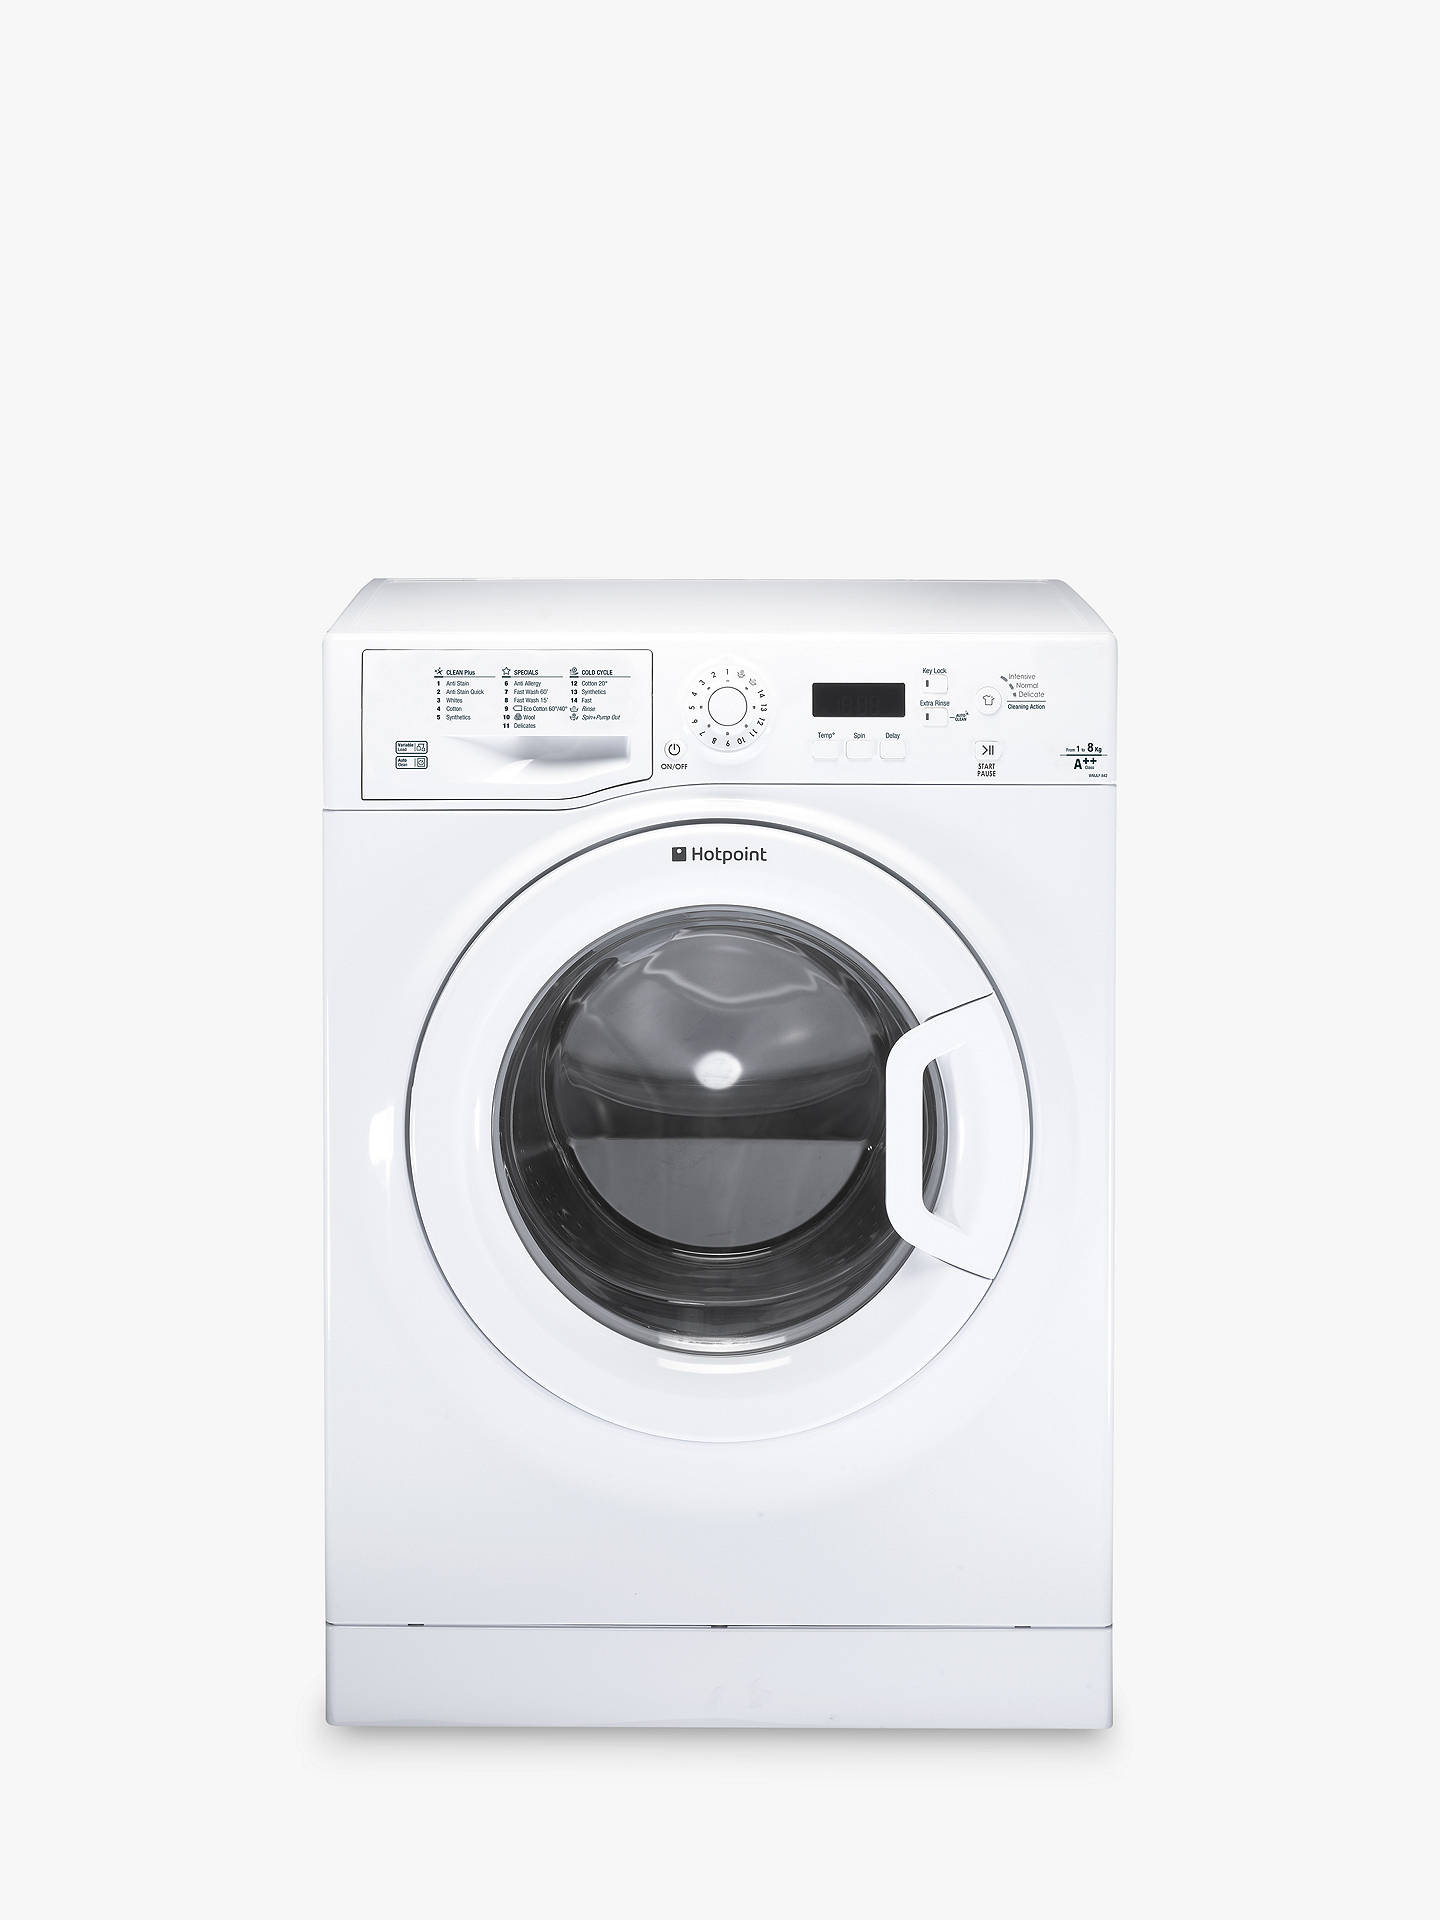 Buy Washing Machine On Credit